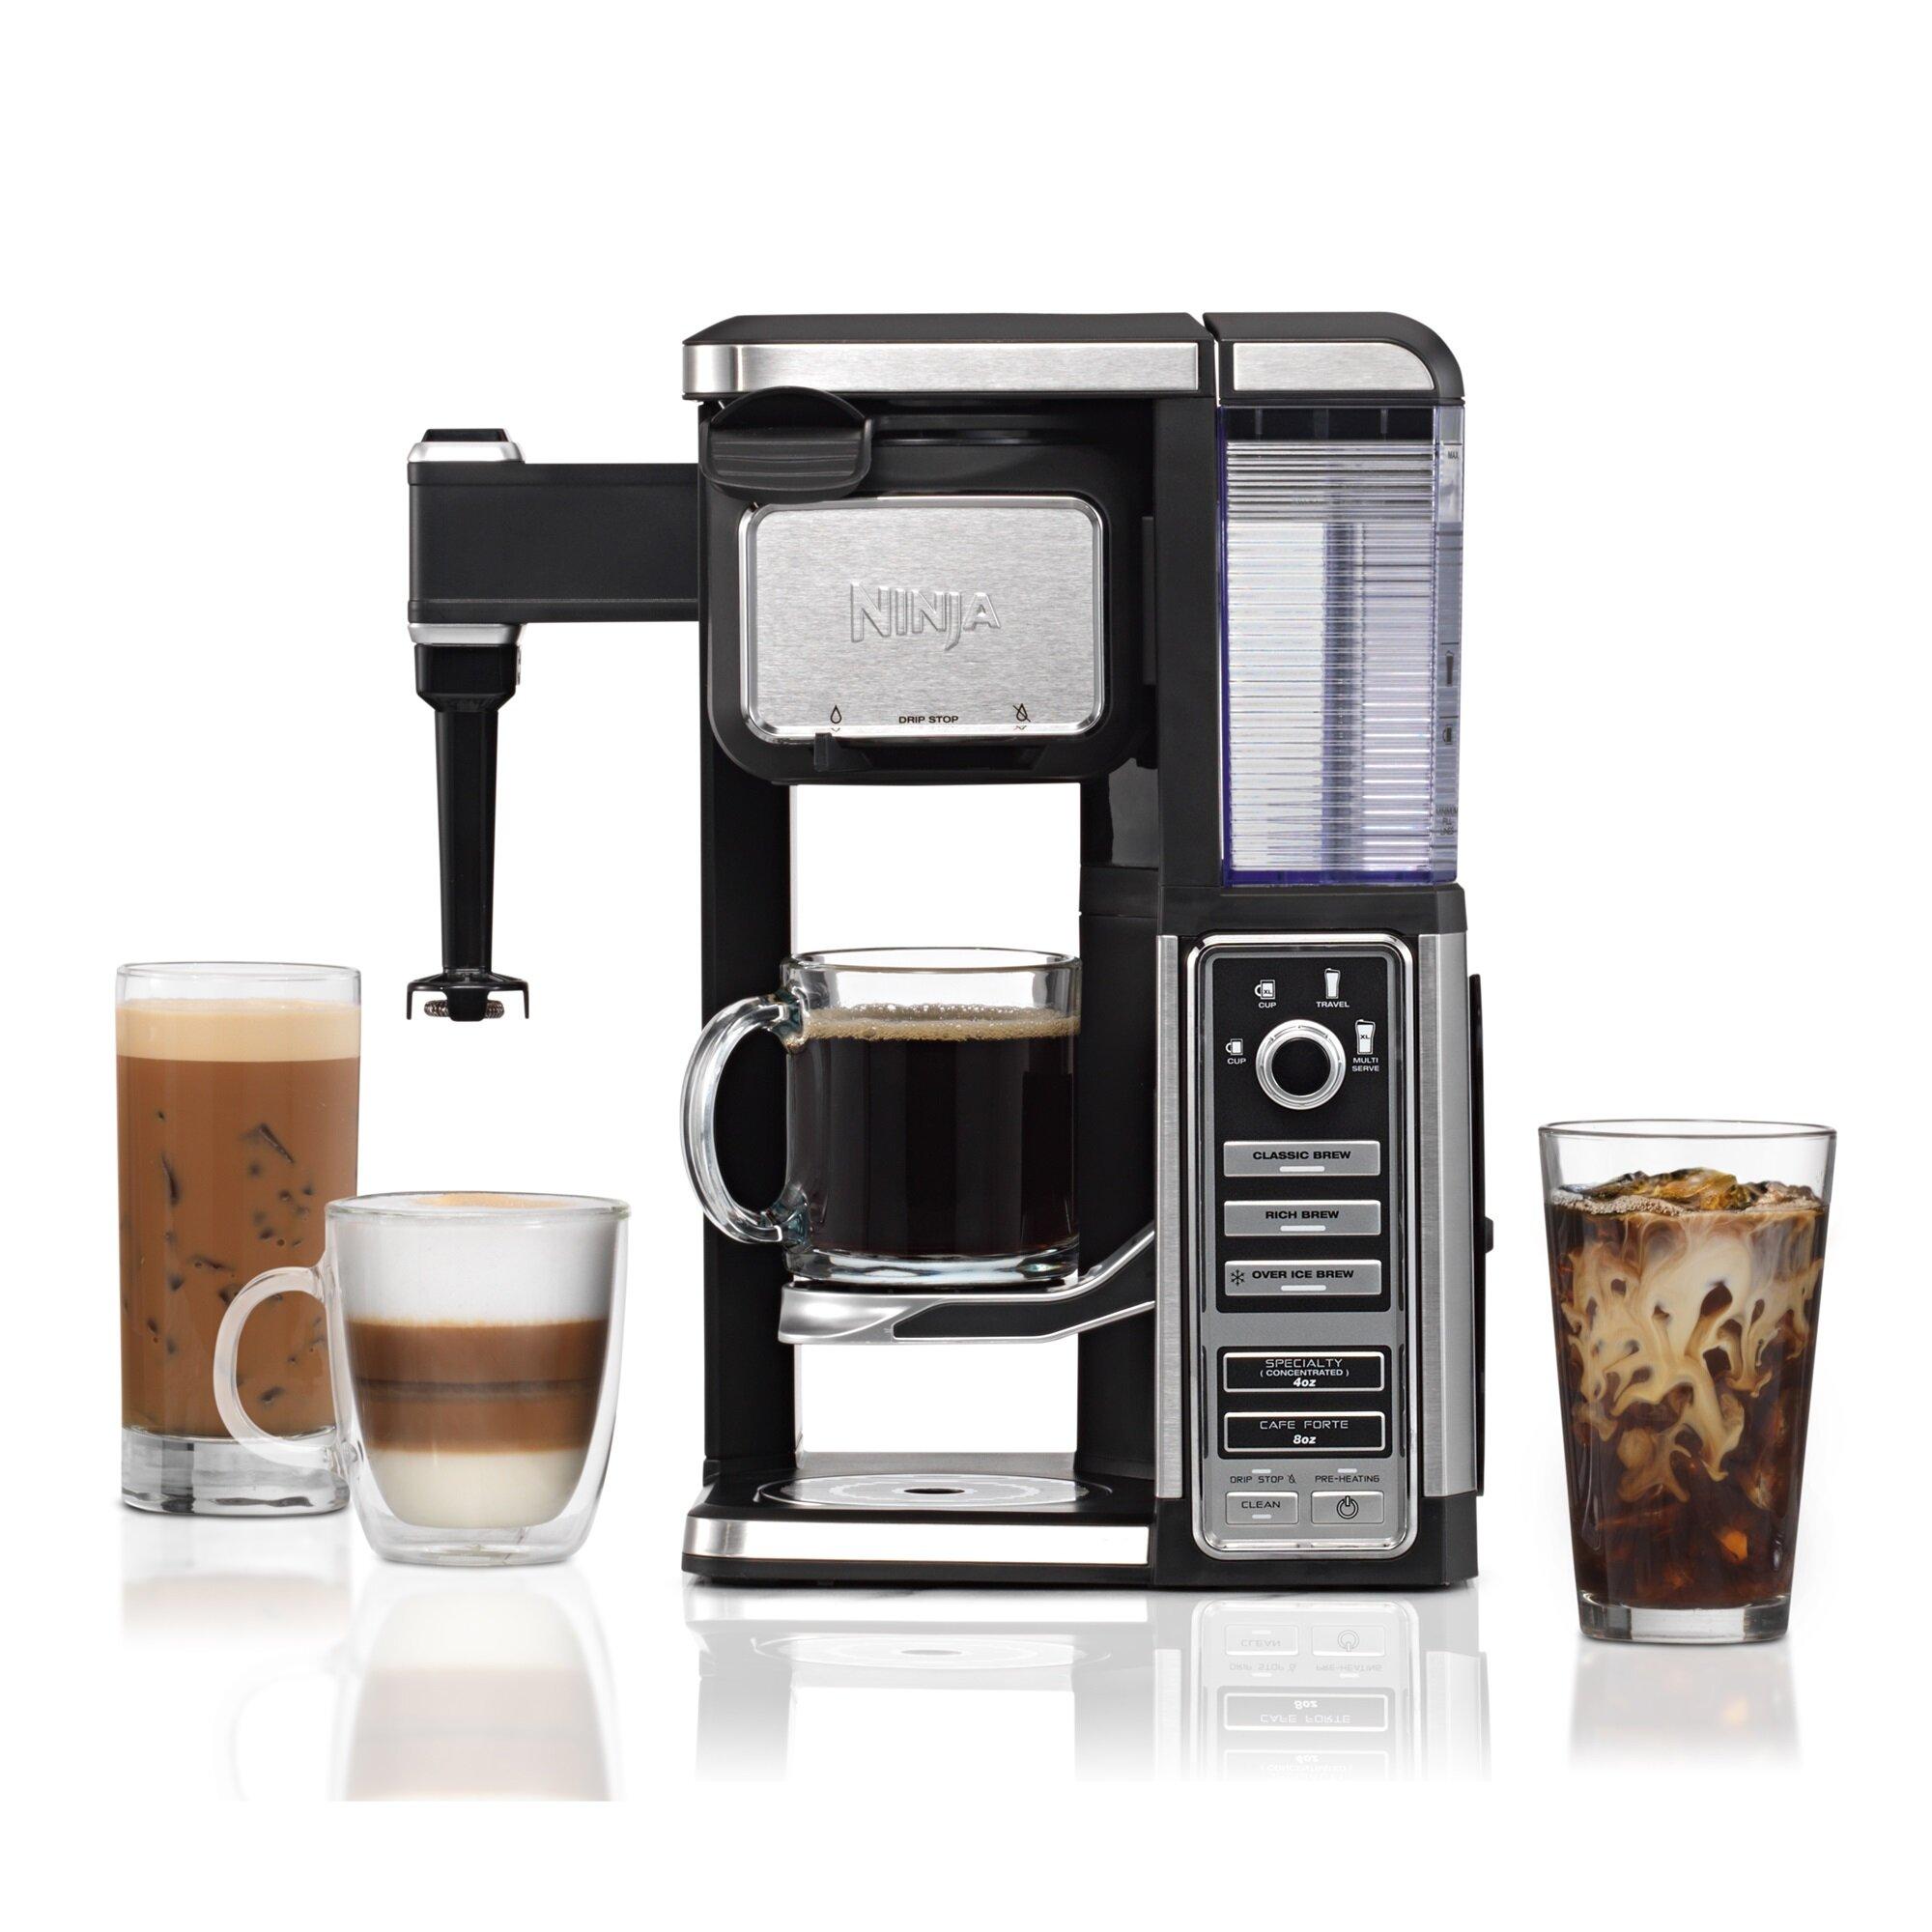 Kitchen Living Coffee Maker Reviews : Ninja Coffee Maker & Reviews Wayfair